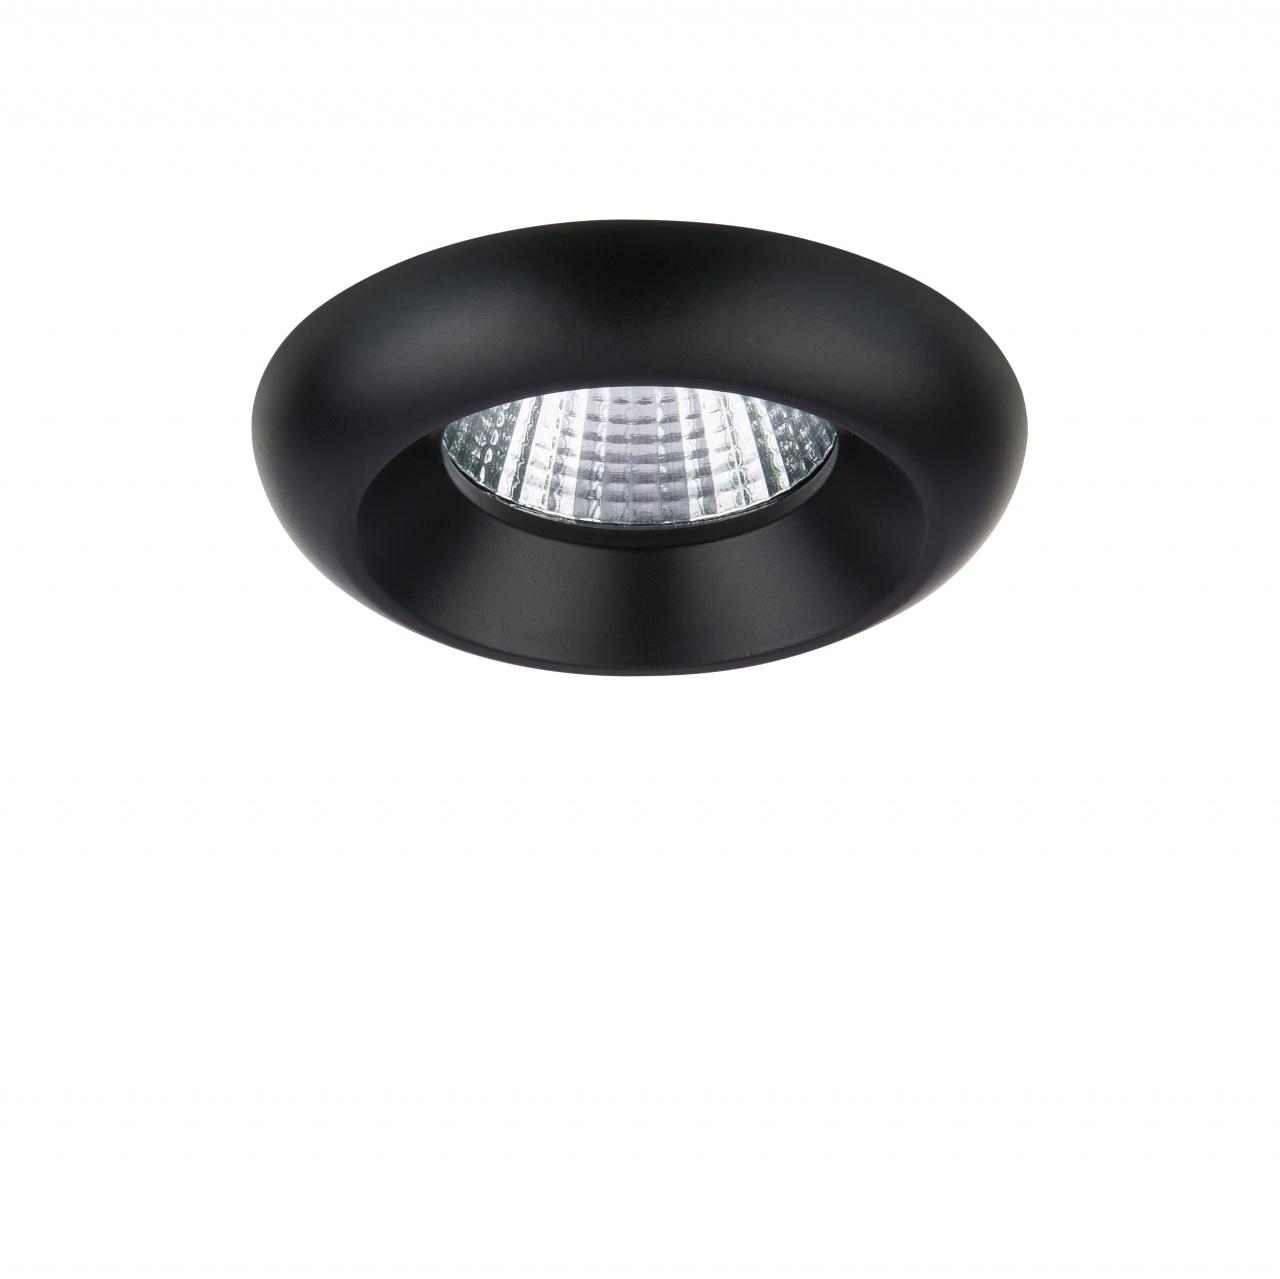 Светильник Monde LED 7W 560LM 50G черный 4000K Lightstar 071177